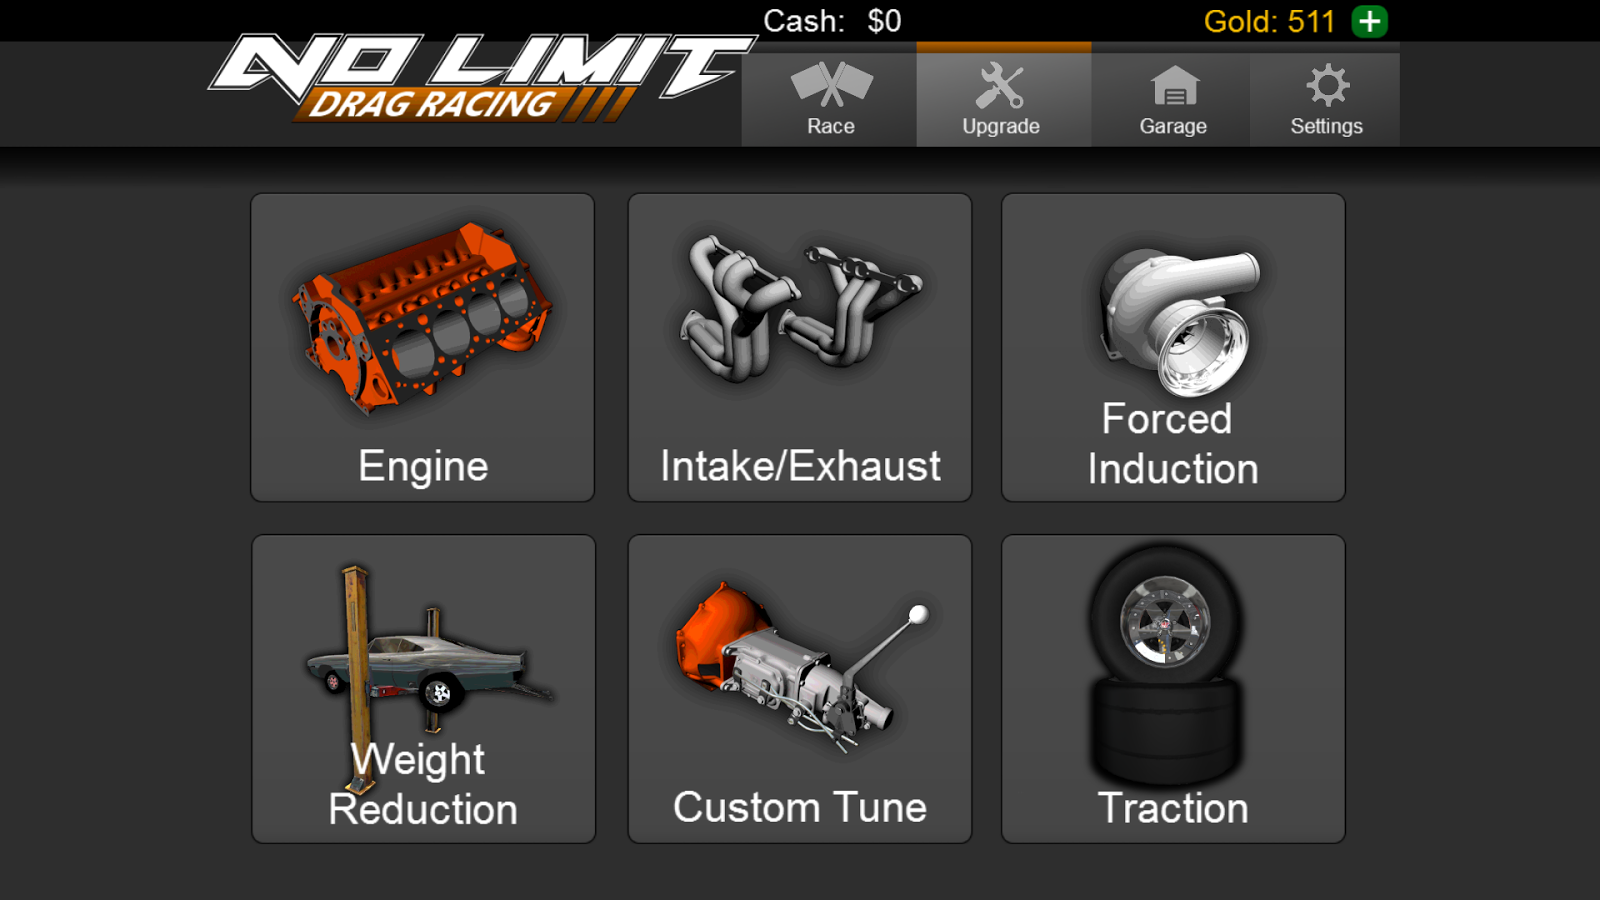 No Limit Drag Racing - Free Download